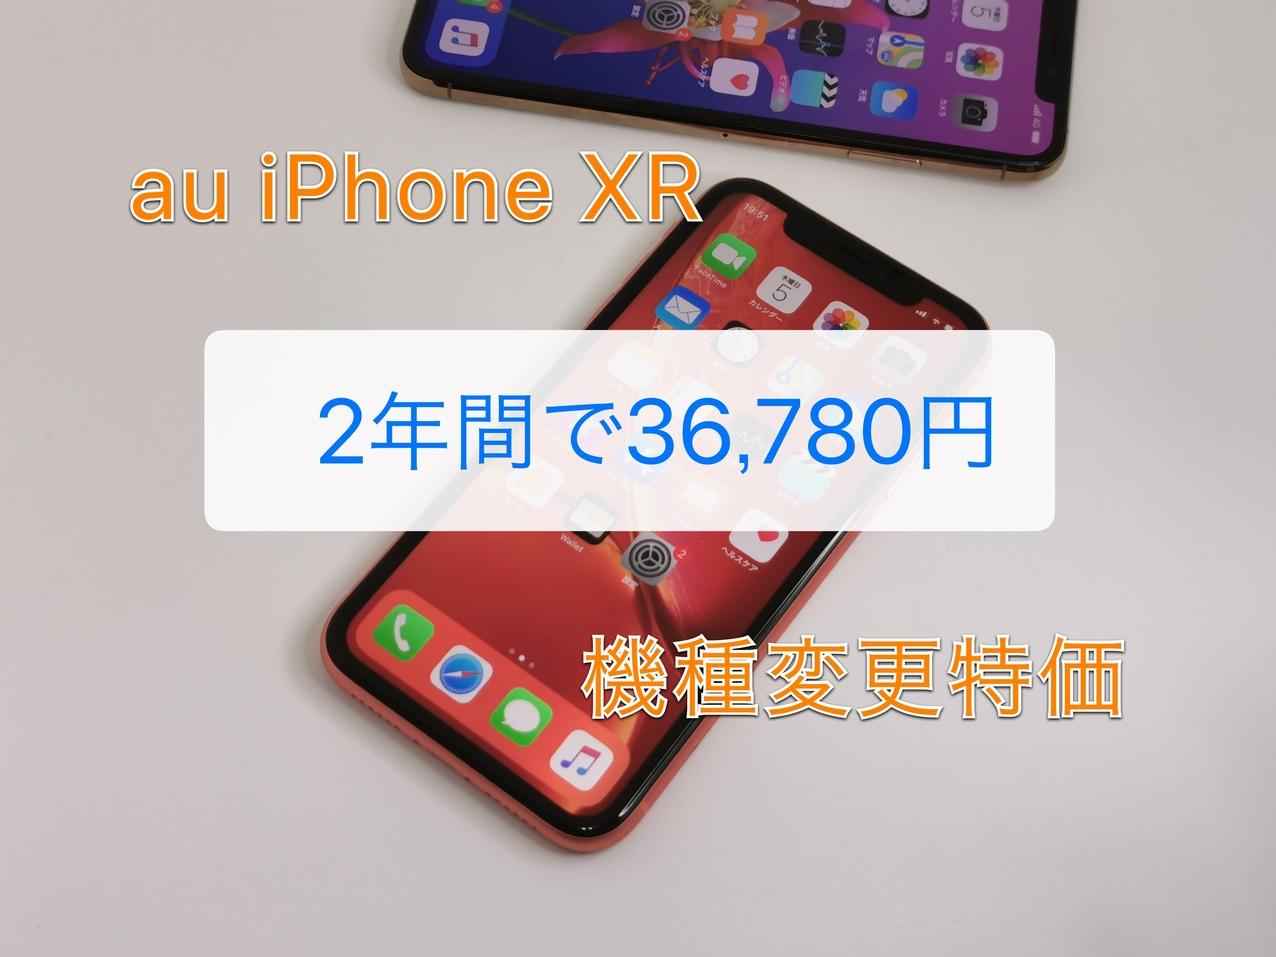 auのiPhone XR、機種変更で2万円の値引きが開始 64GBで7万円台、アップグレードプログラムで3万円台の安売り